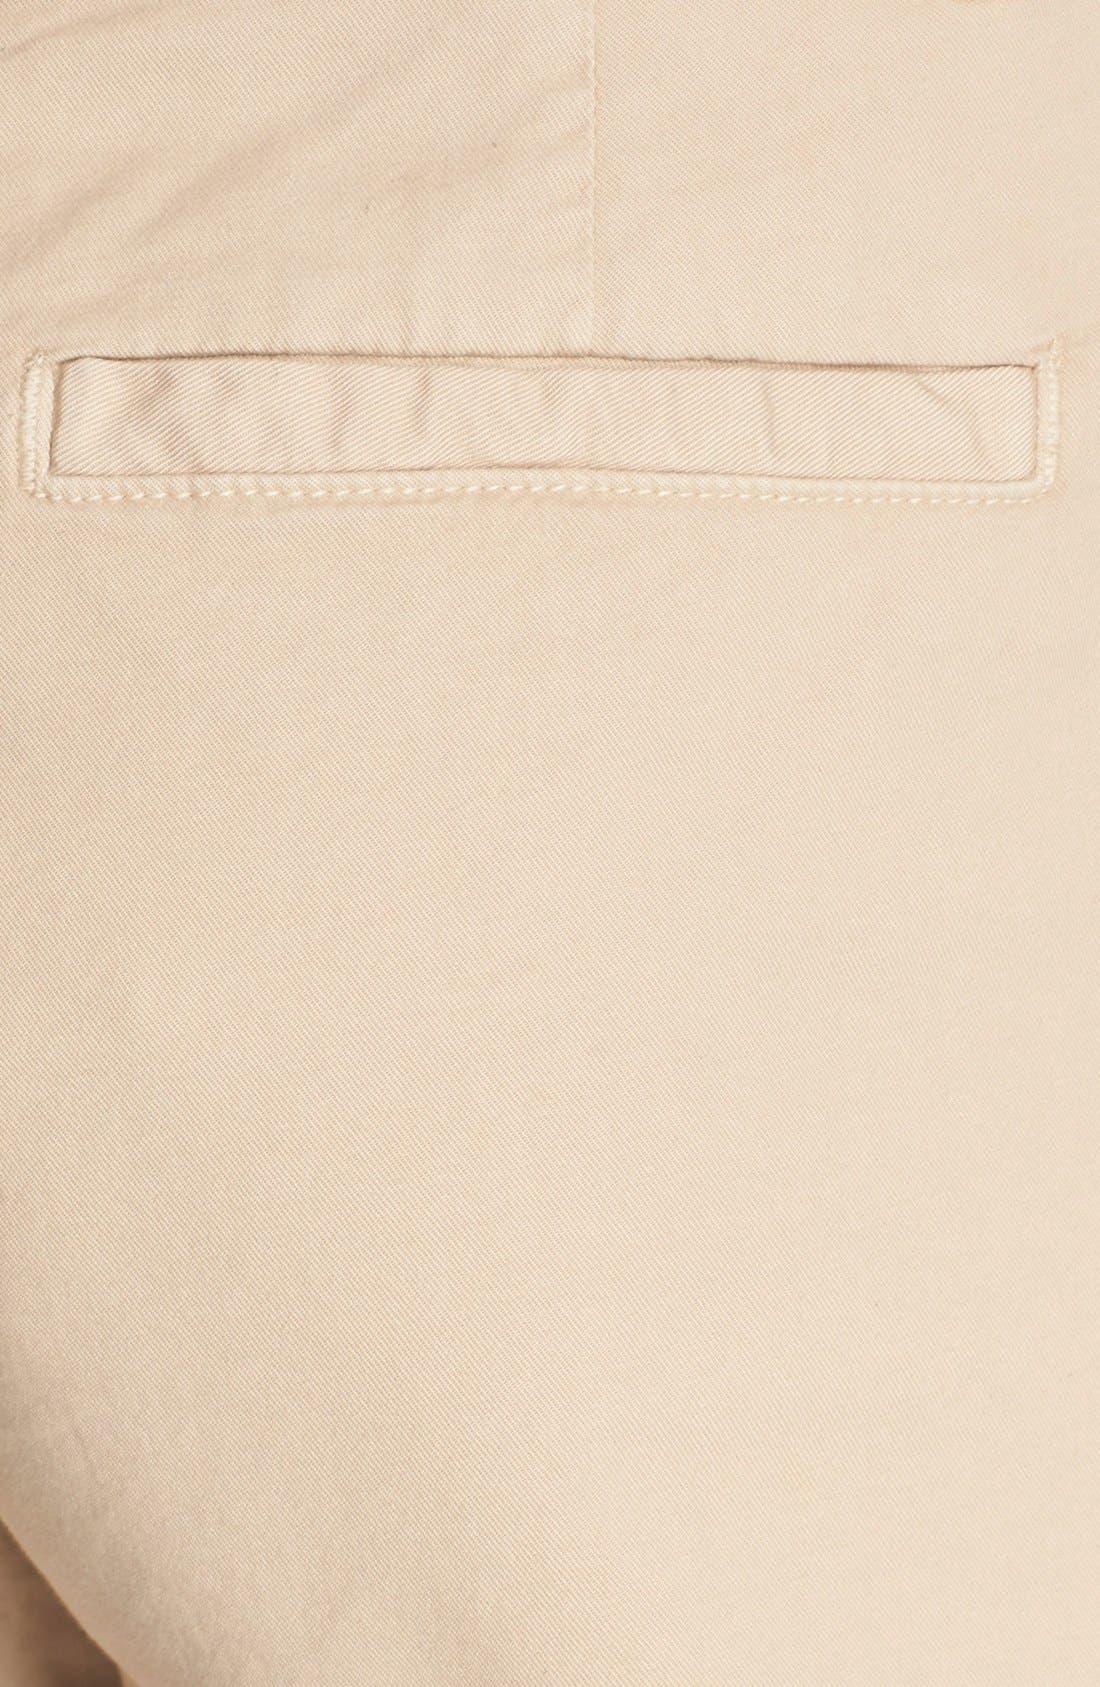 Alternate Image 3  - Joie 'Jardin' Belted Chino Shorts